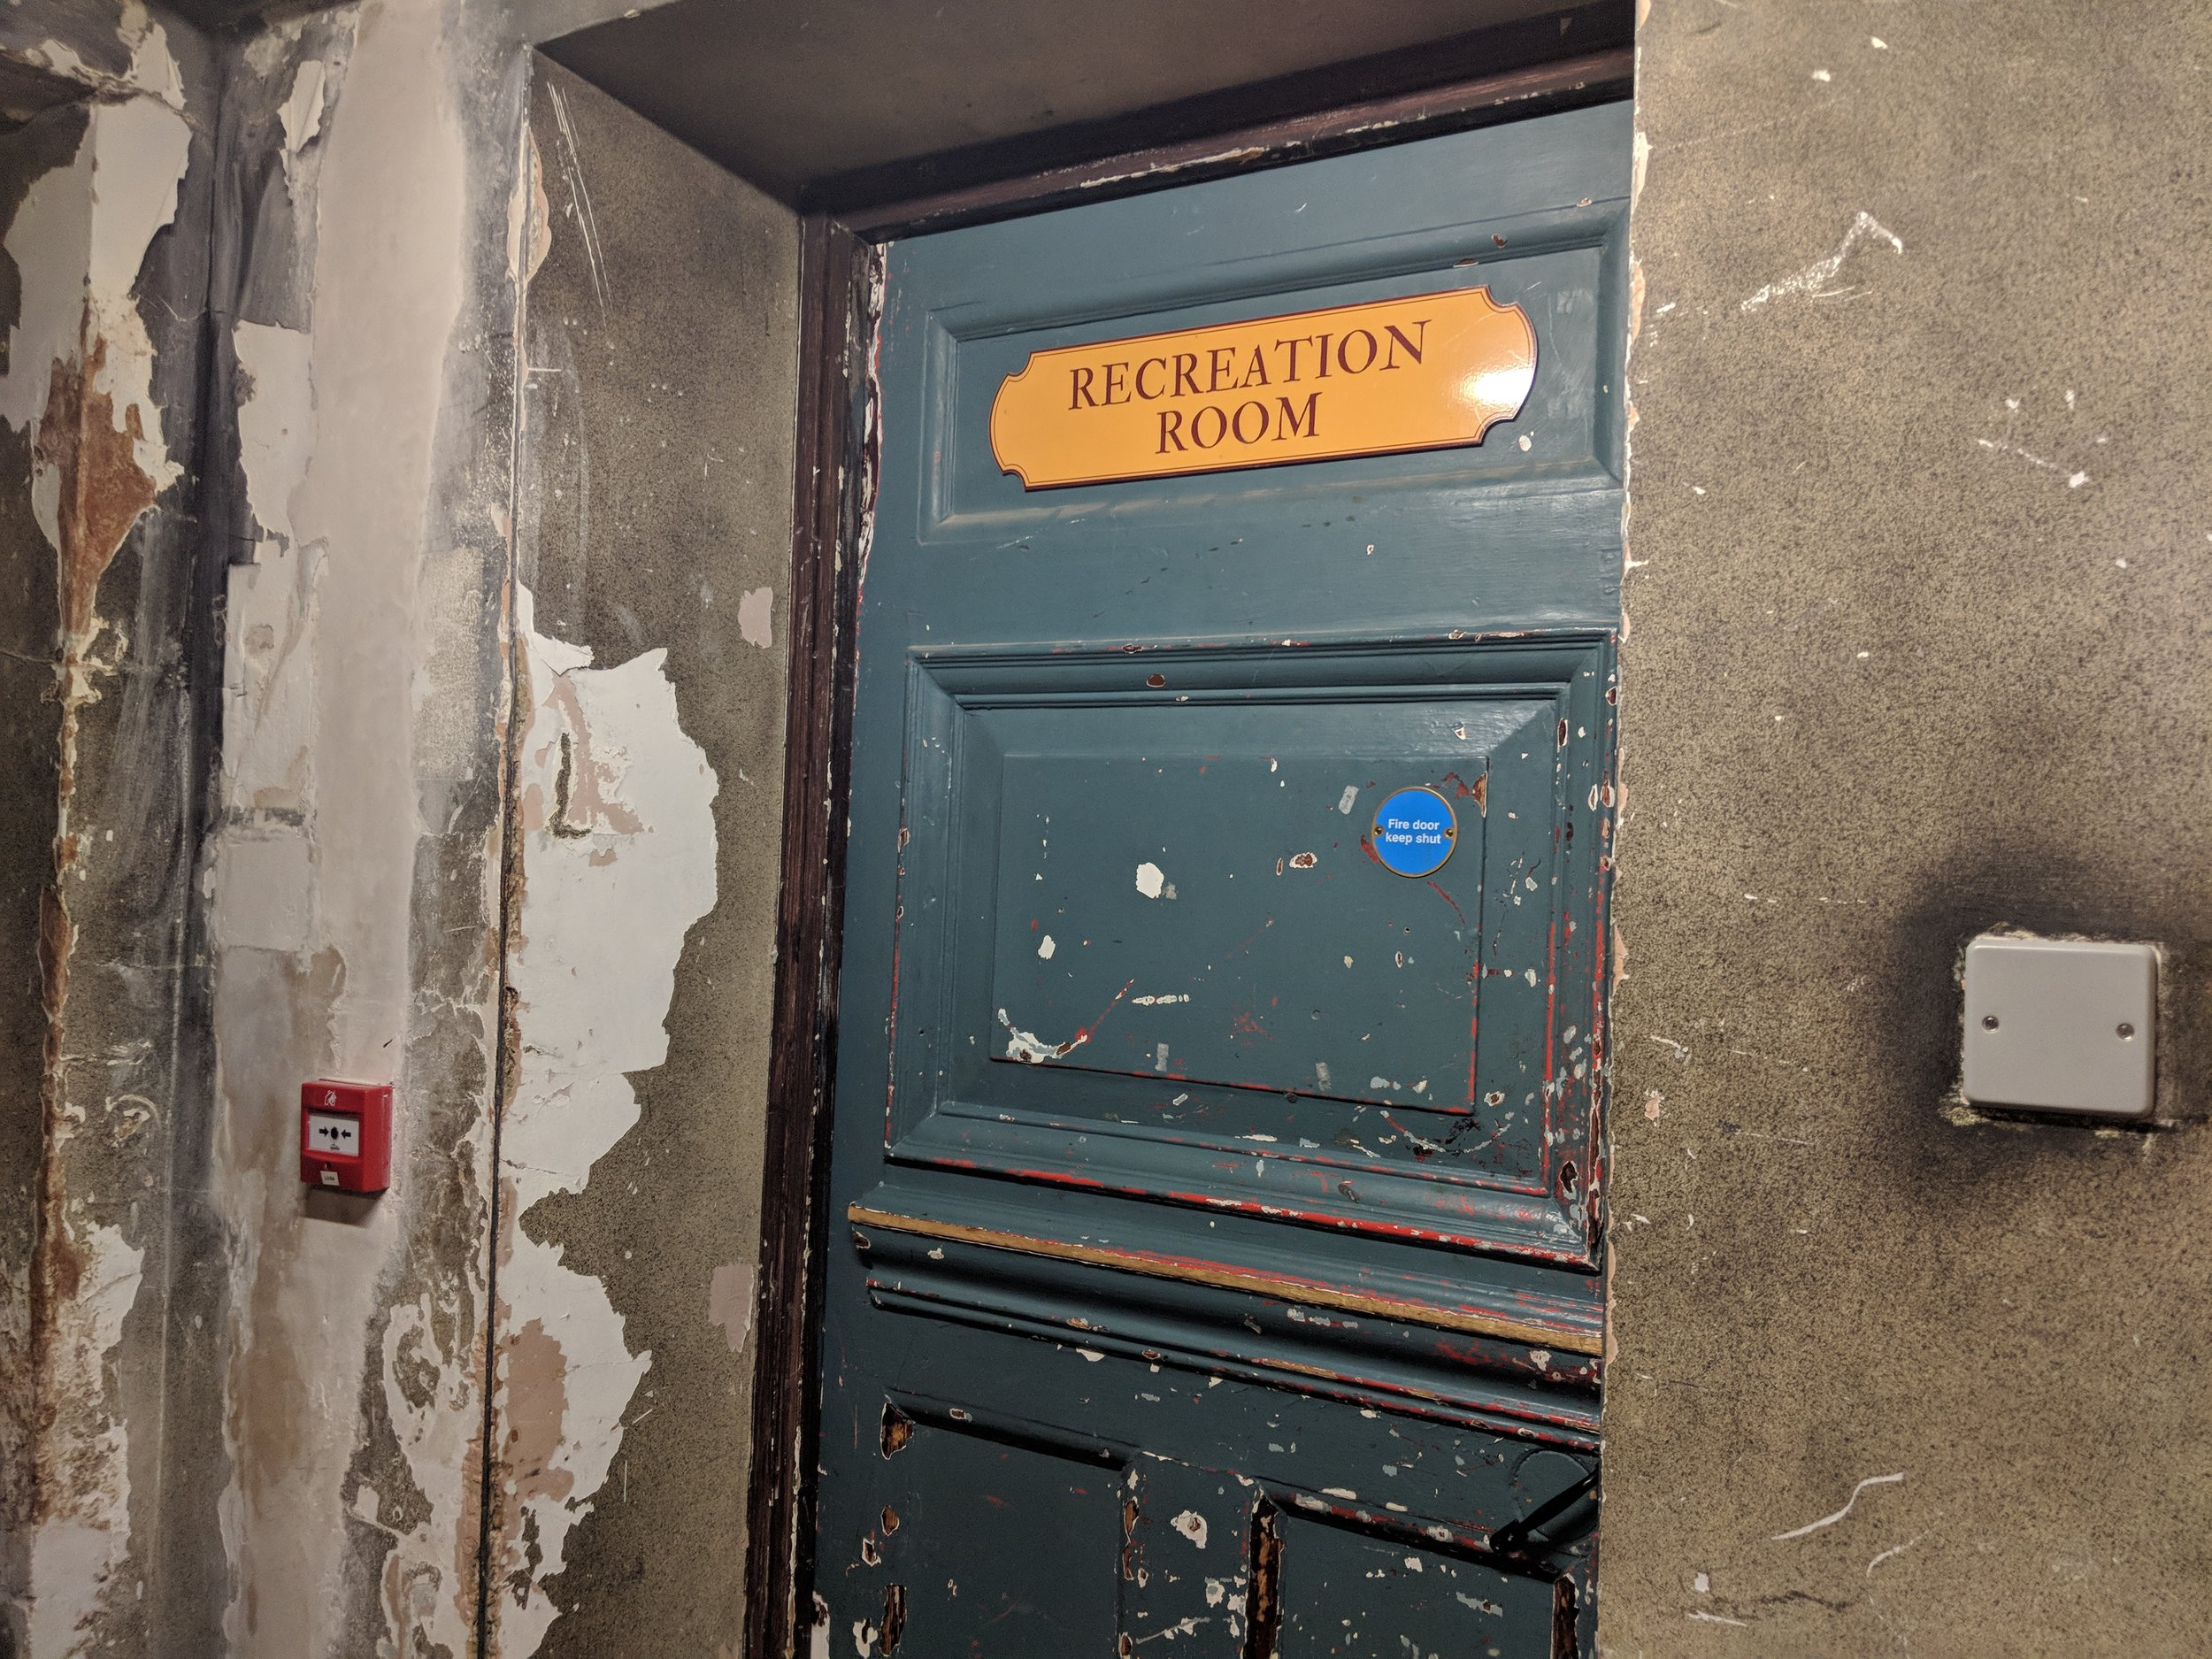 Battersea Arts Centre(Recreation Room) - visited 29/03/2019